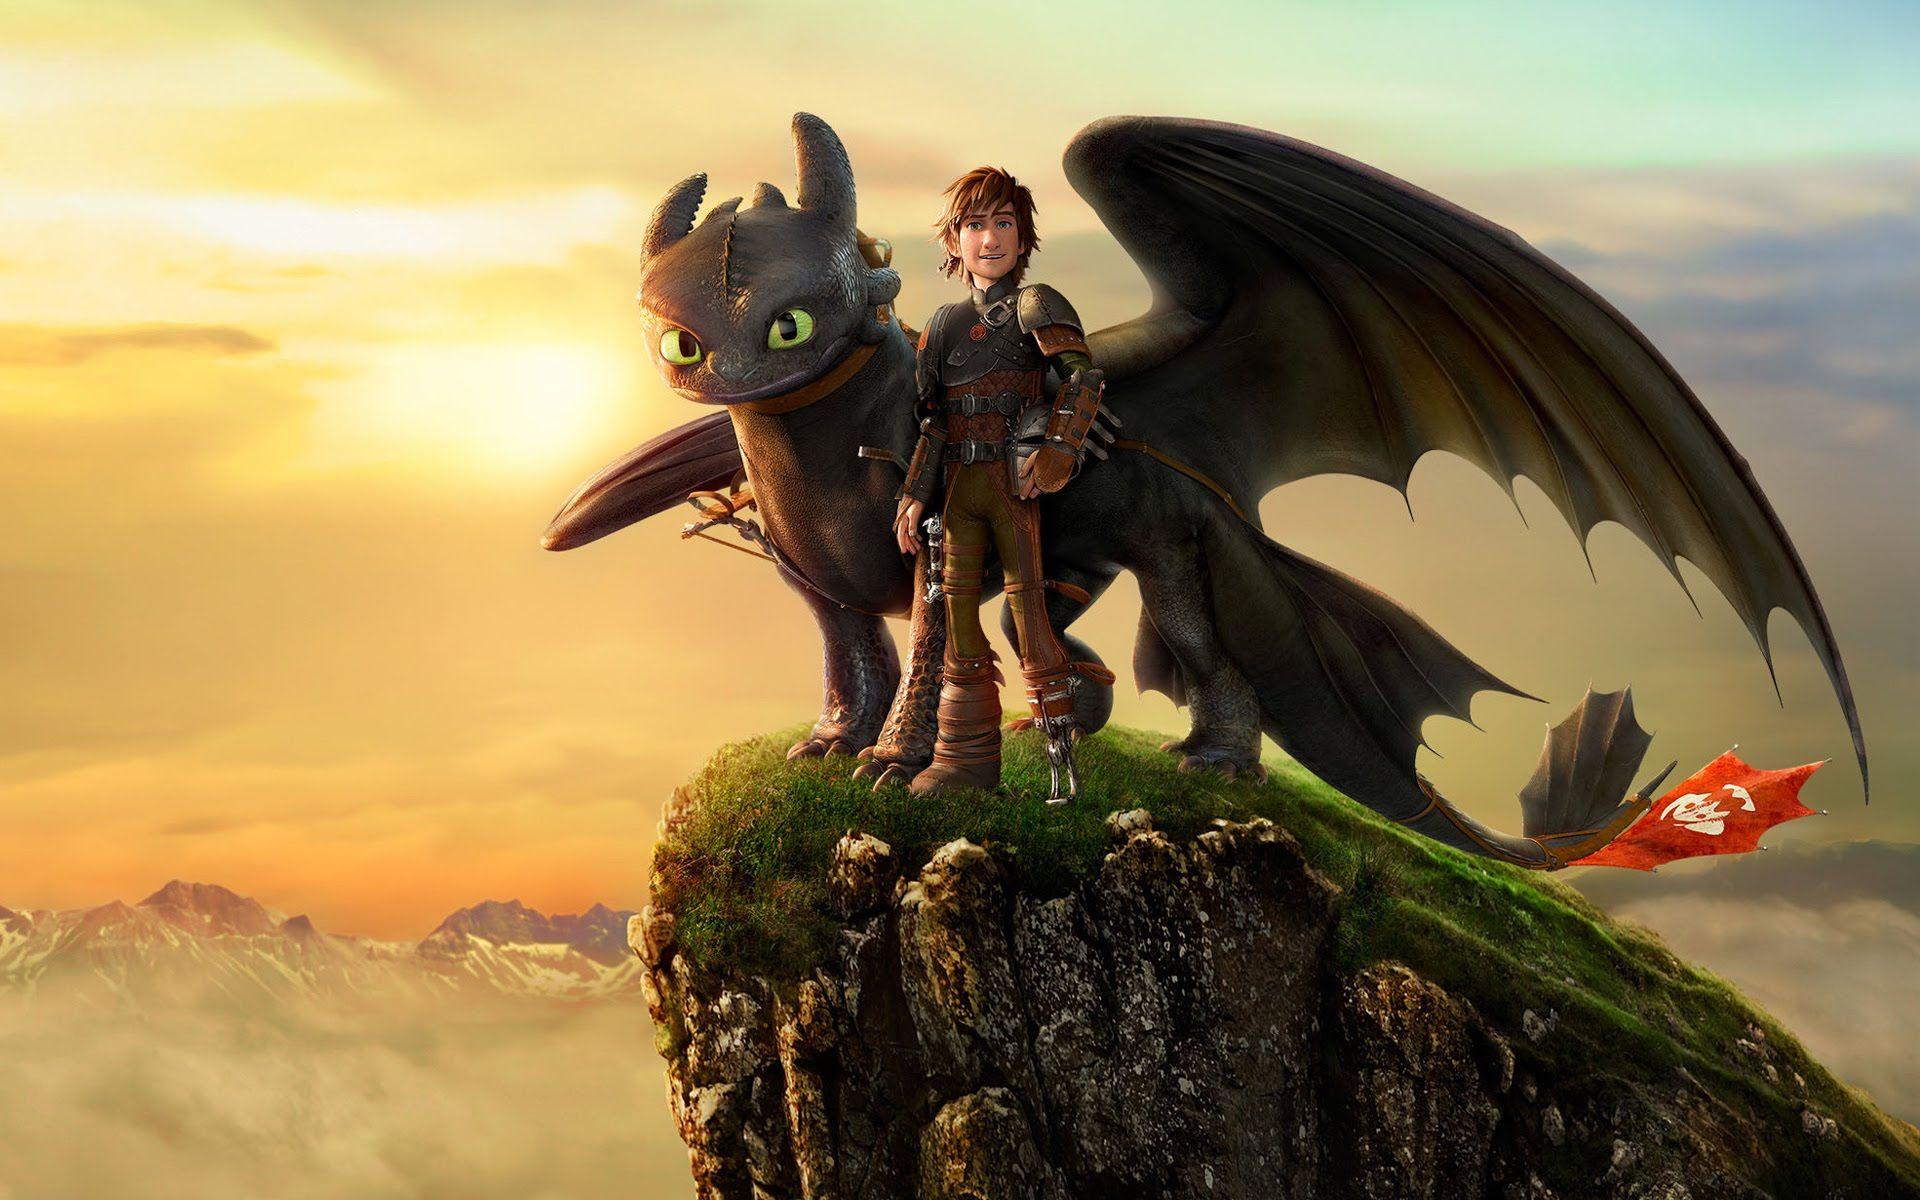 Dragons 2 Complet En Francais Film D Animation Complet Phim Hoạt Hinh Hoạt Hinh Disney